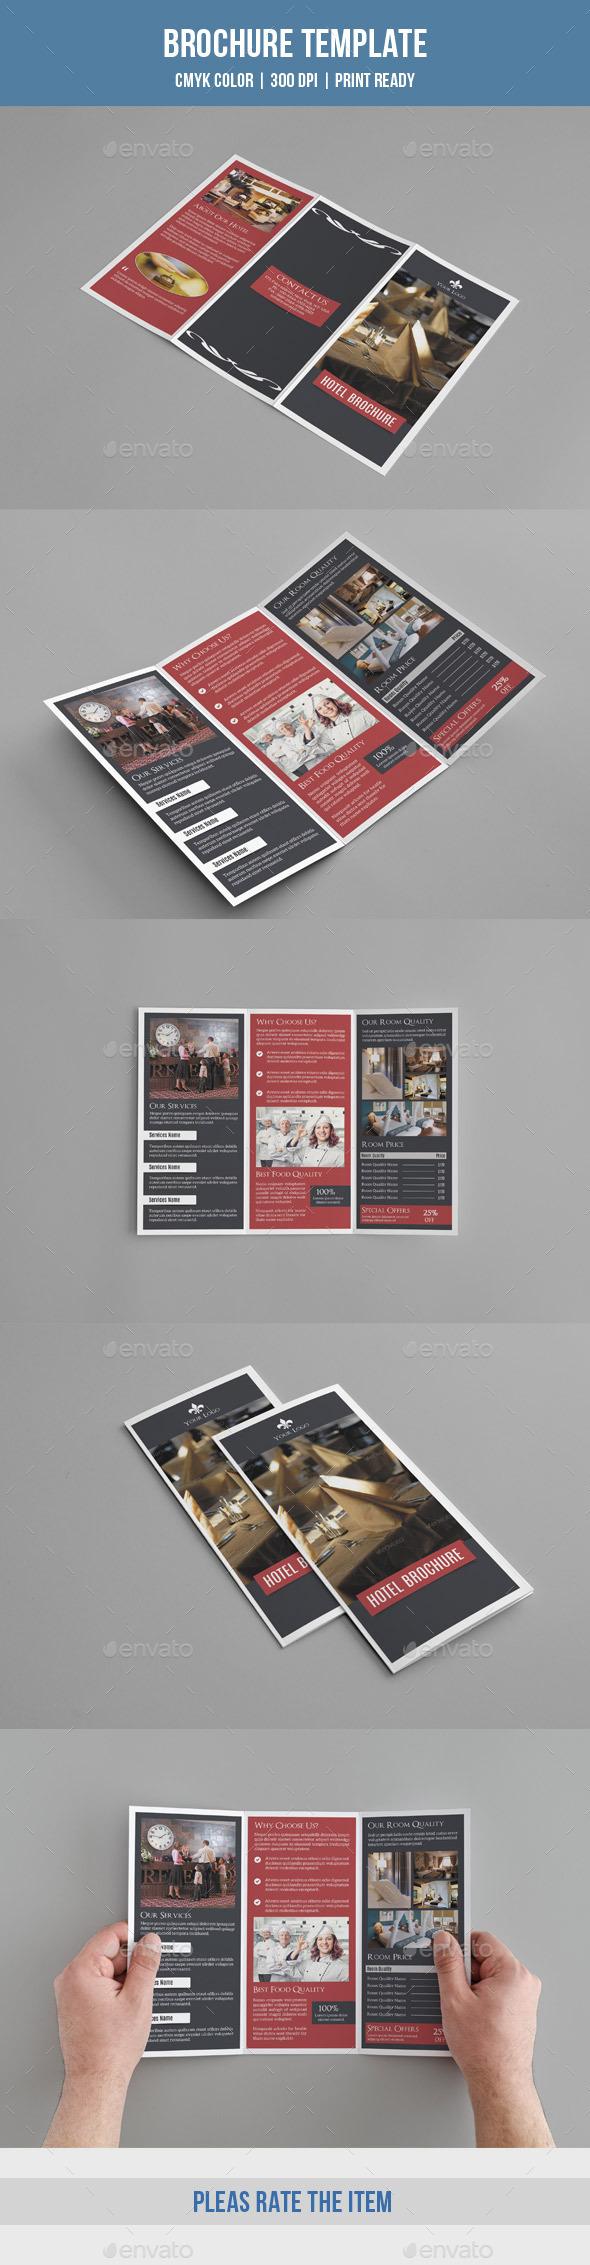 GraphicRiver Trifold Hotel Brochure-v190 9589733